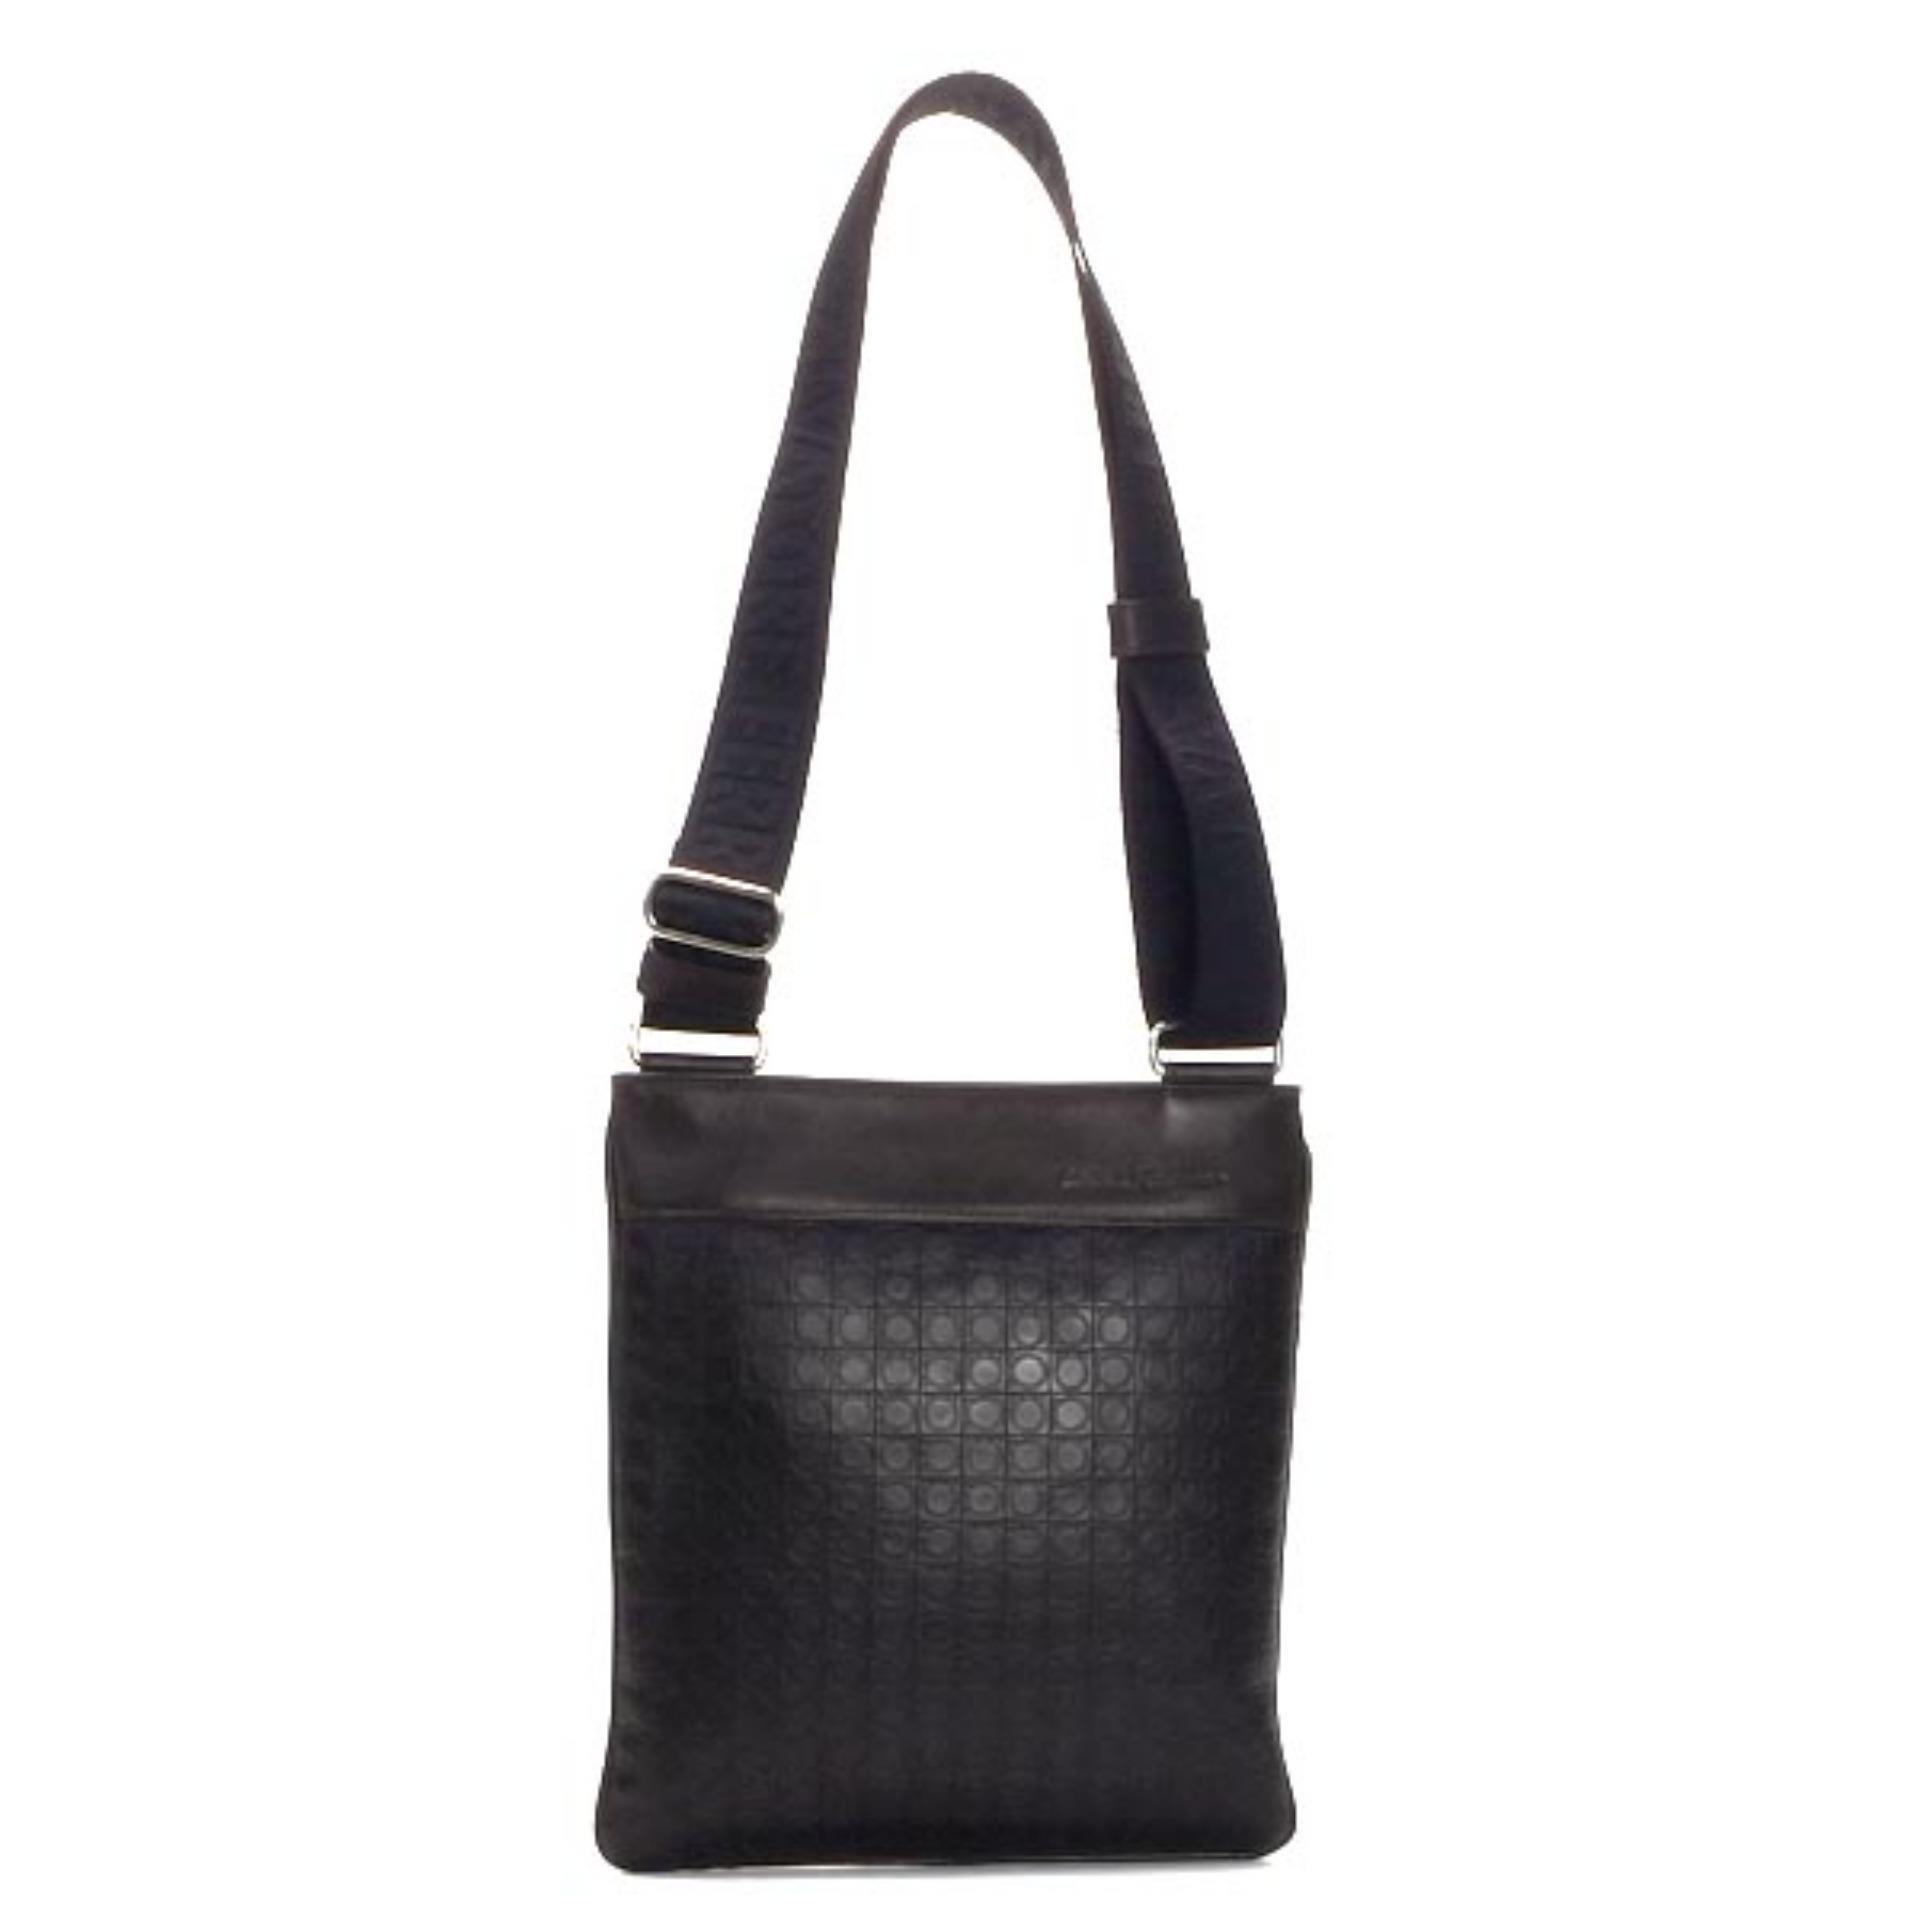 Salvatore Ferragamo Gancio Flat Crossbody Bag (Caffe)   249420533858 bf6aed648a0e9